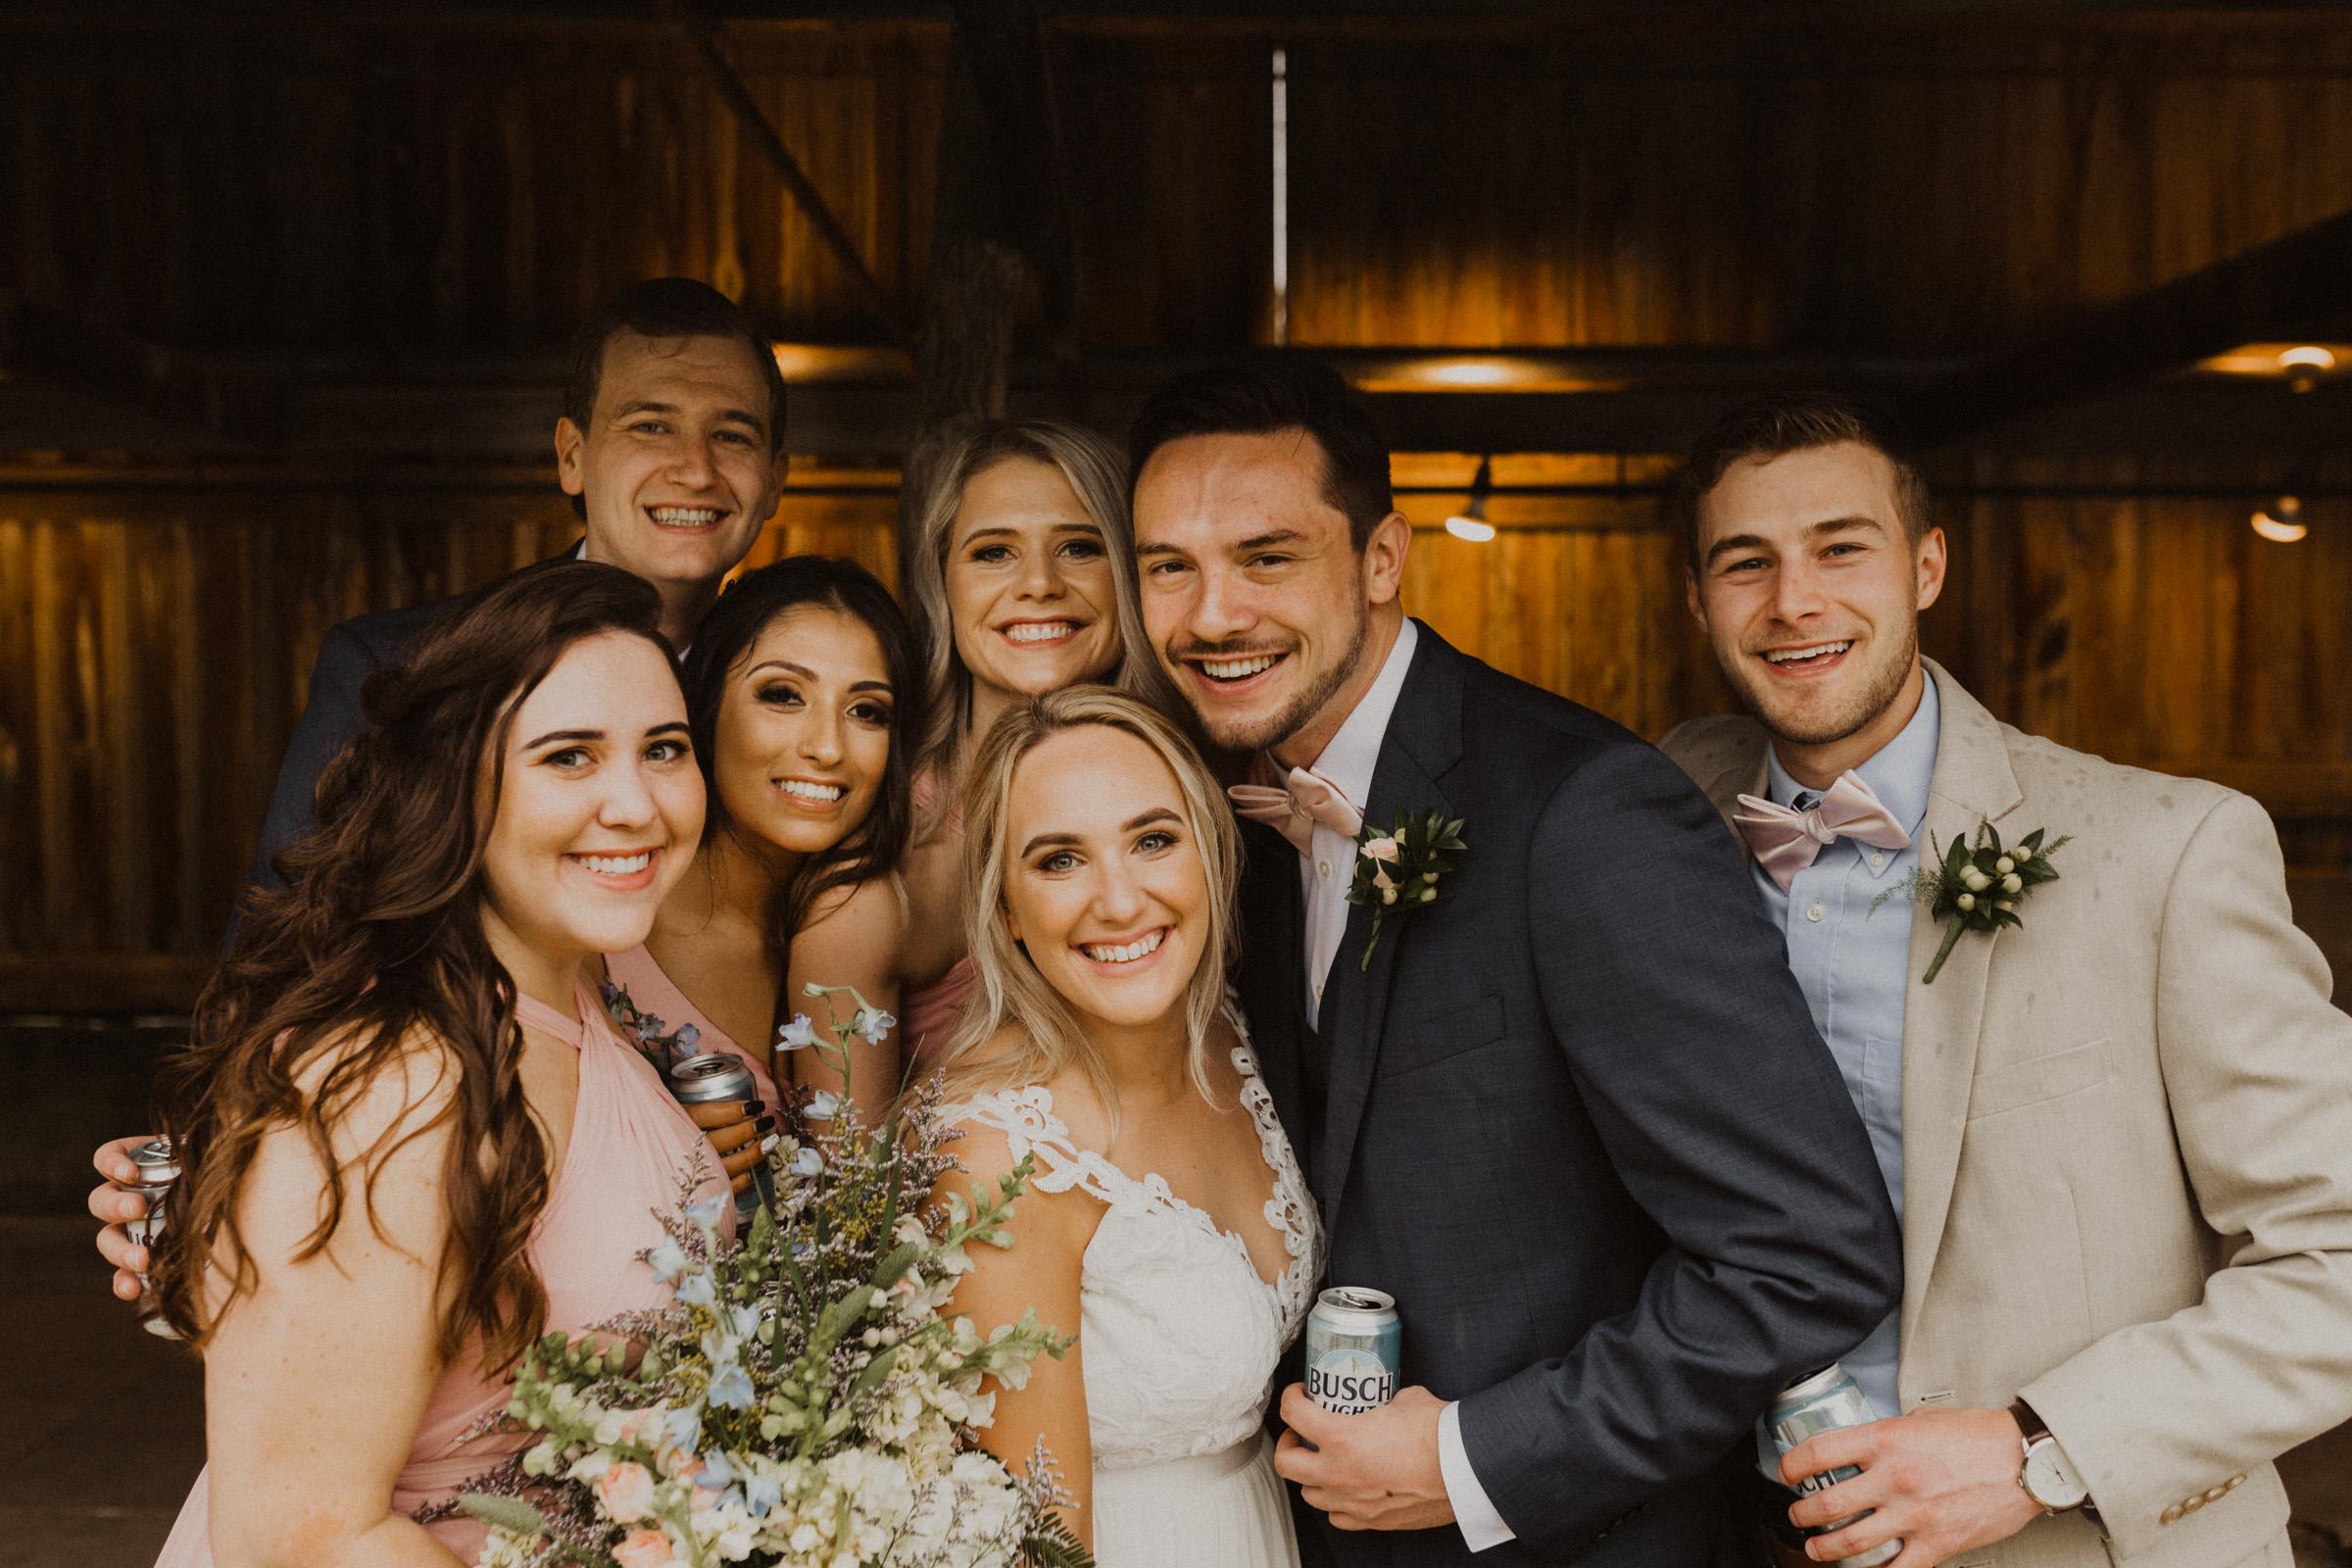 alyssa barletter photography nelson wedding nebraska city lied lodge morton barn spring wedding photographer-22.jpg